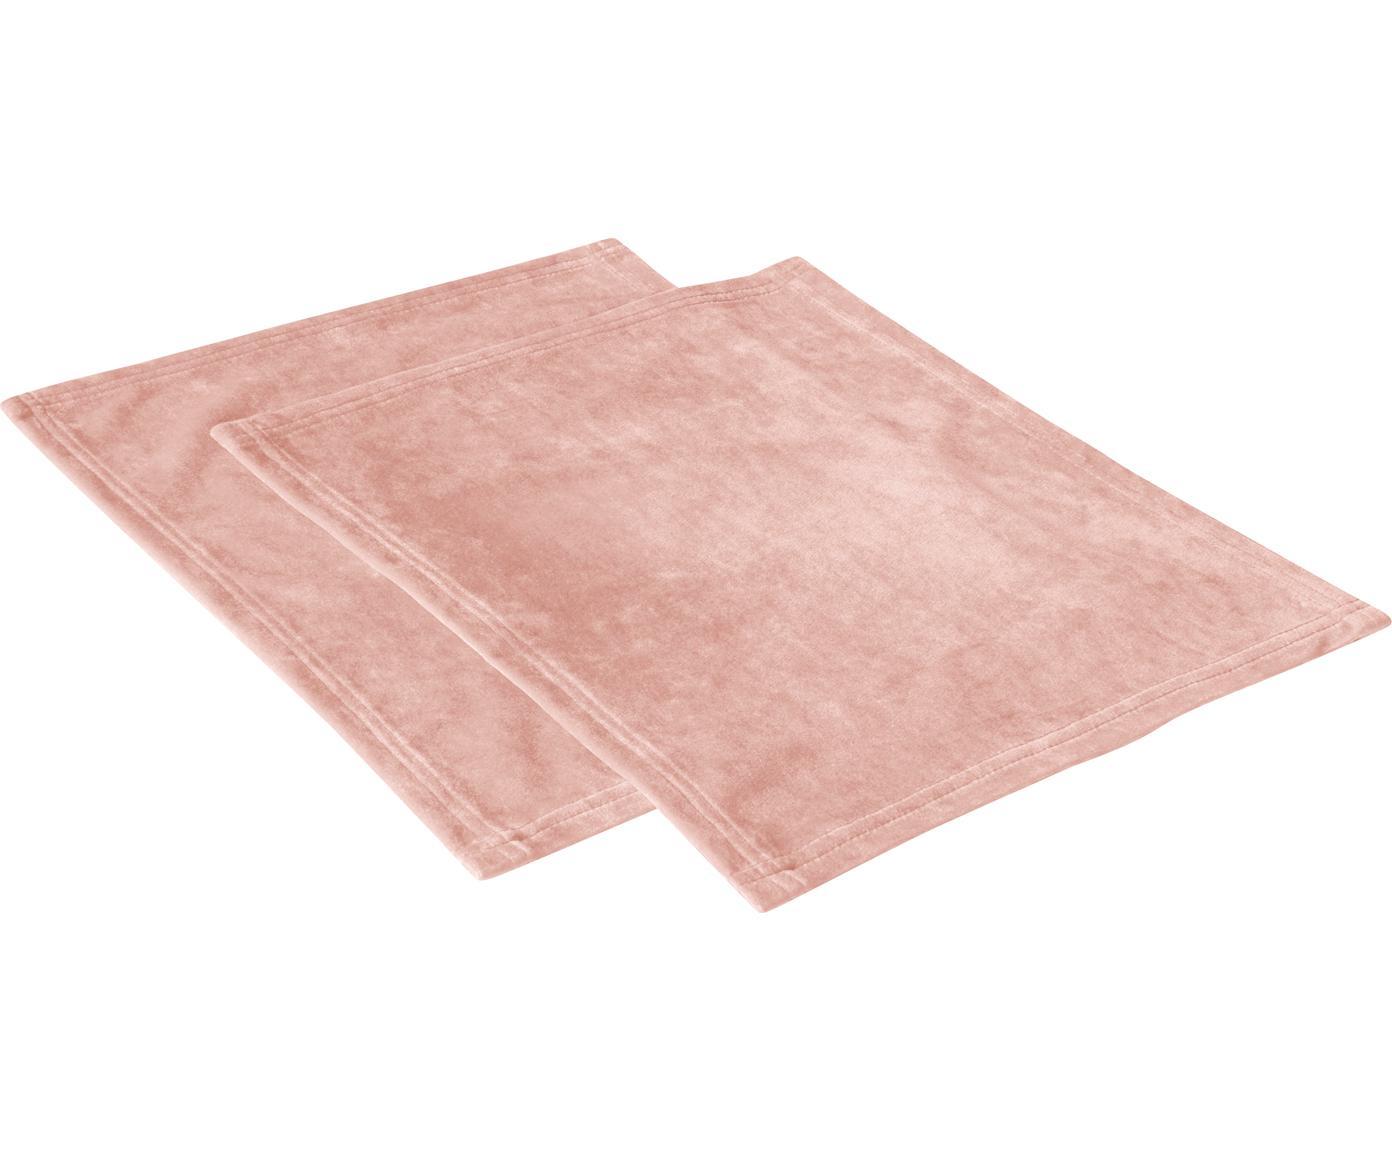 Fluwelen placemats Simone, 2 stuks, 100% polyester fluweel, Roze, 35 x 45 cm